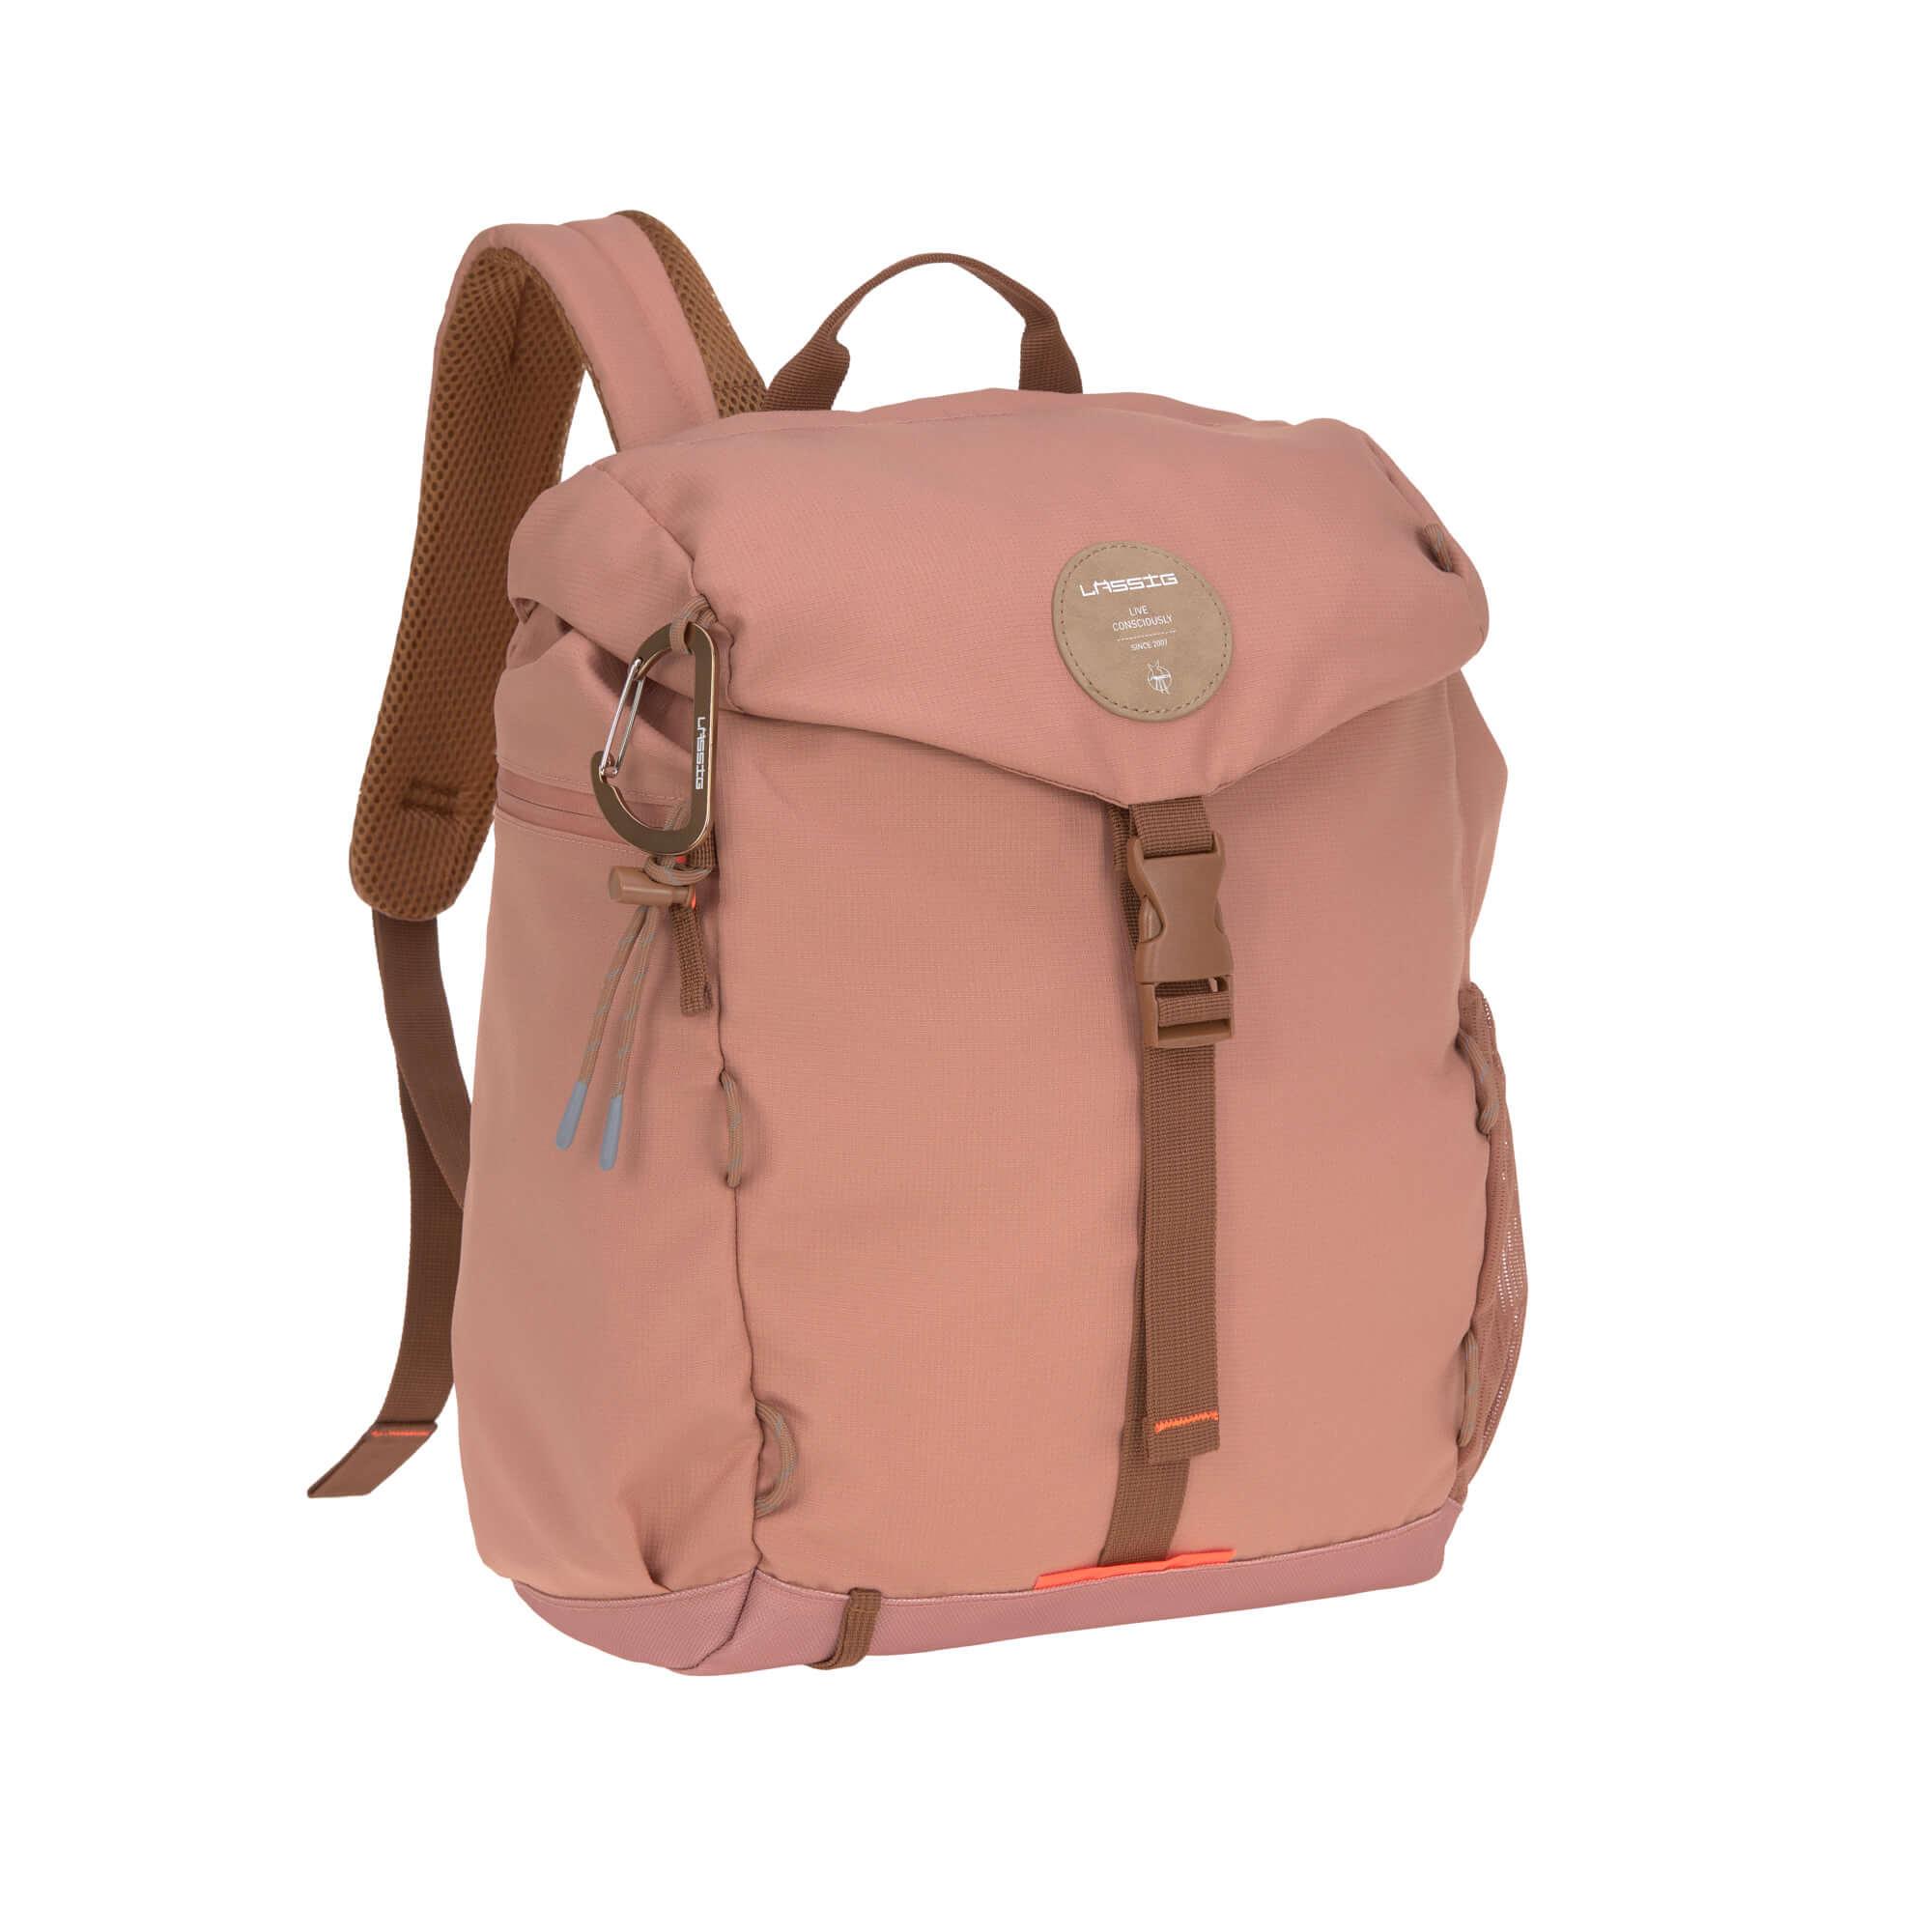 Lassig Wickelrucksack Outdoor Backpack Cinnamon Lassig Fashion